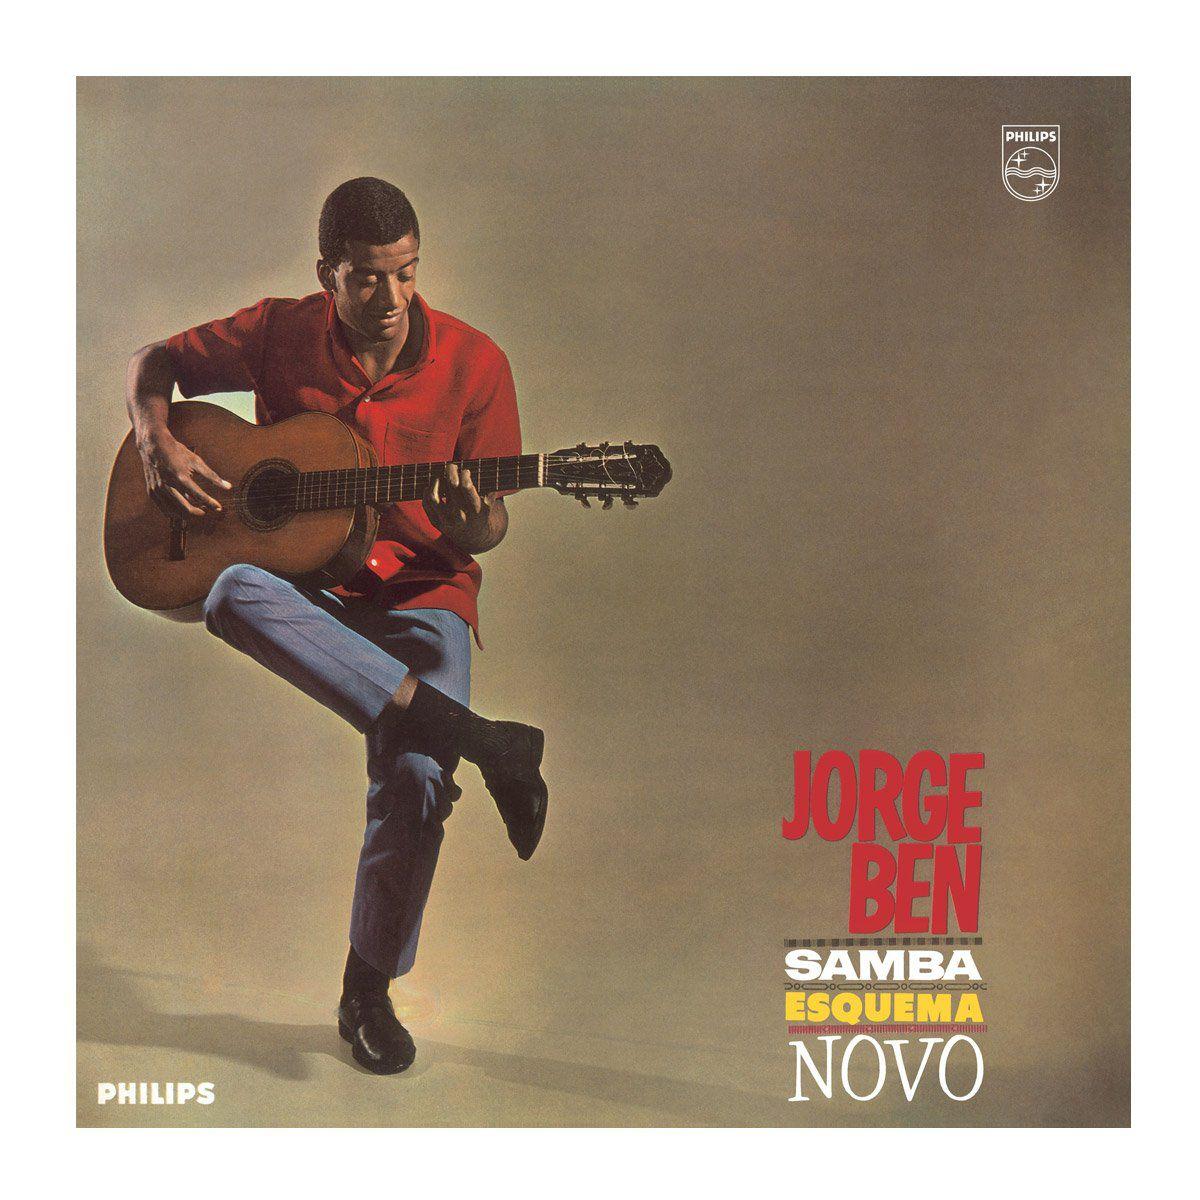 LP Jorge Ben Samba Esquema Novo  - bandUP Store Marketplace